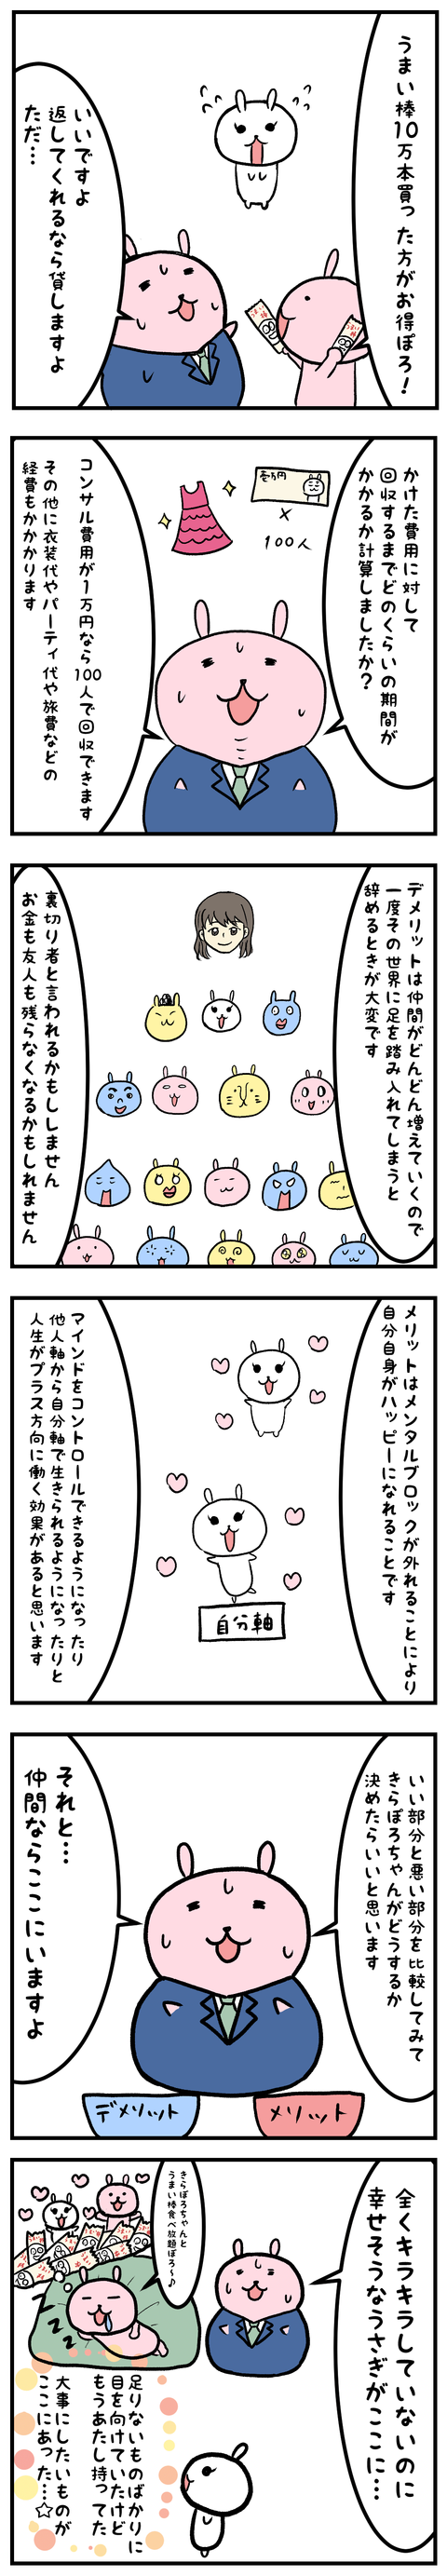 manga-yuzuporo09-1